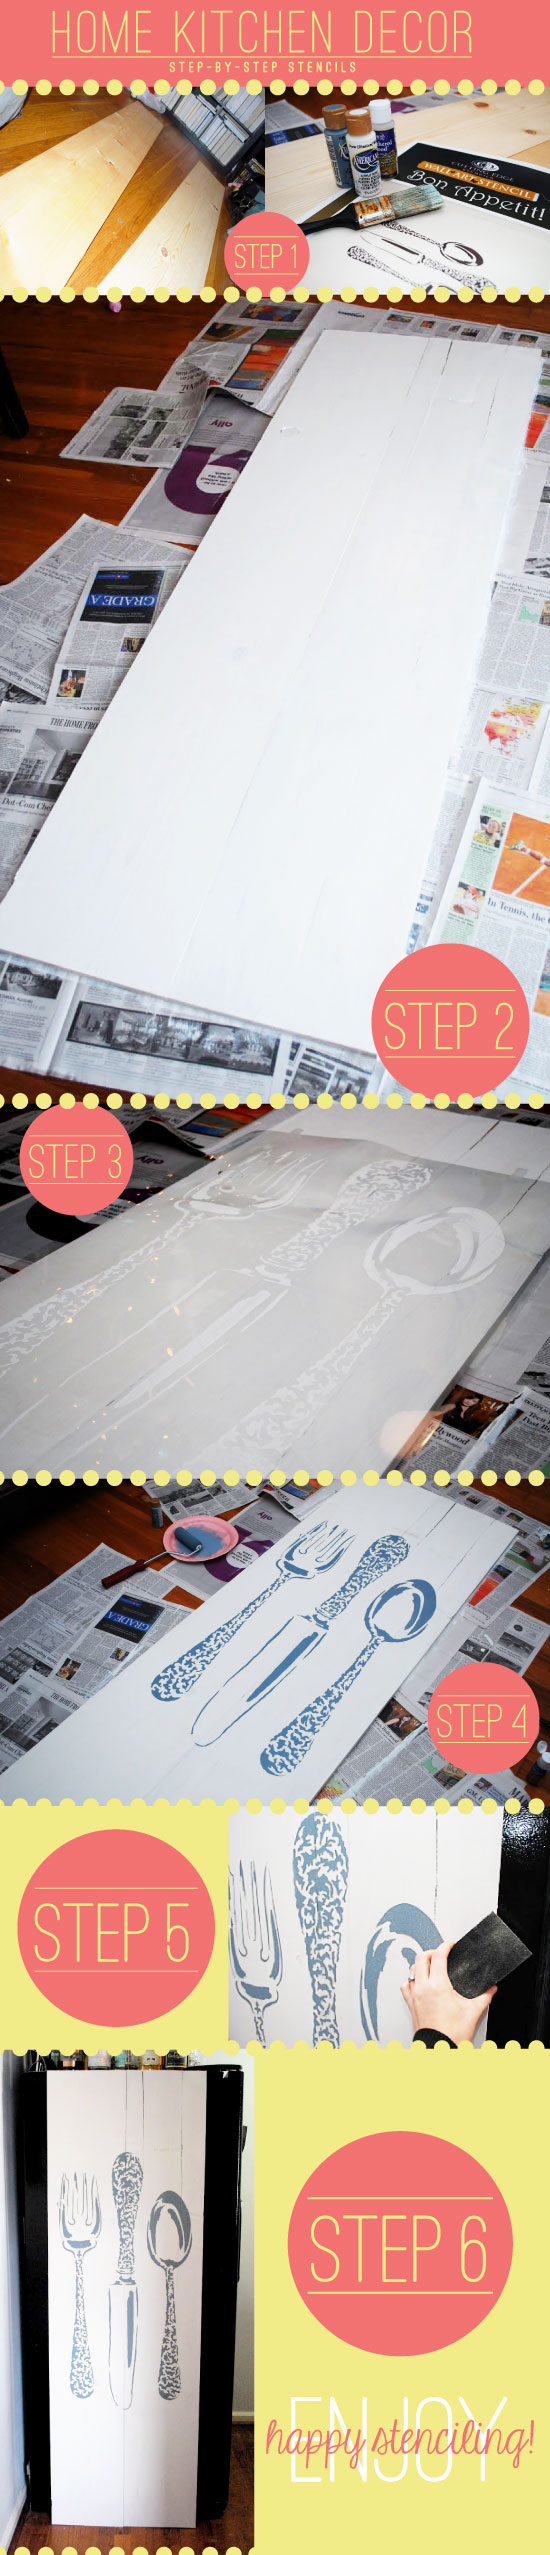 Stenciling Kitchen Decor using Bon Appetit Stencil tutorial